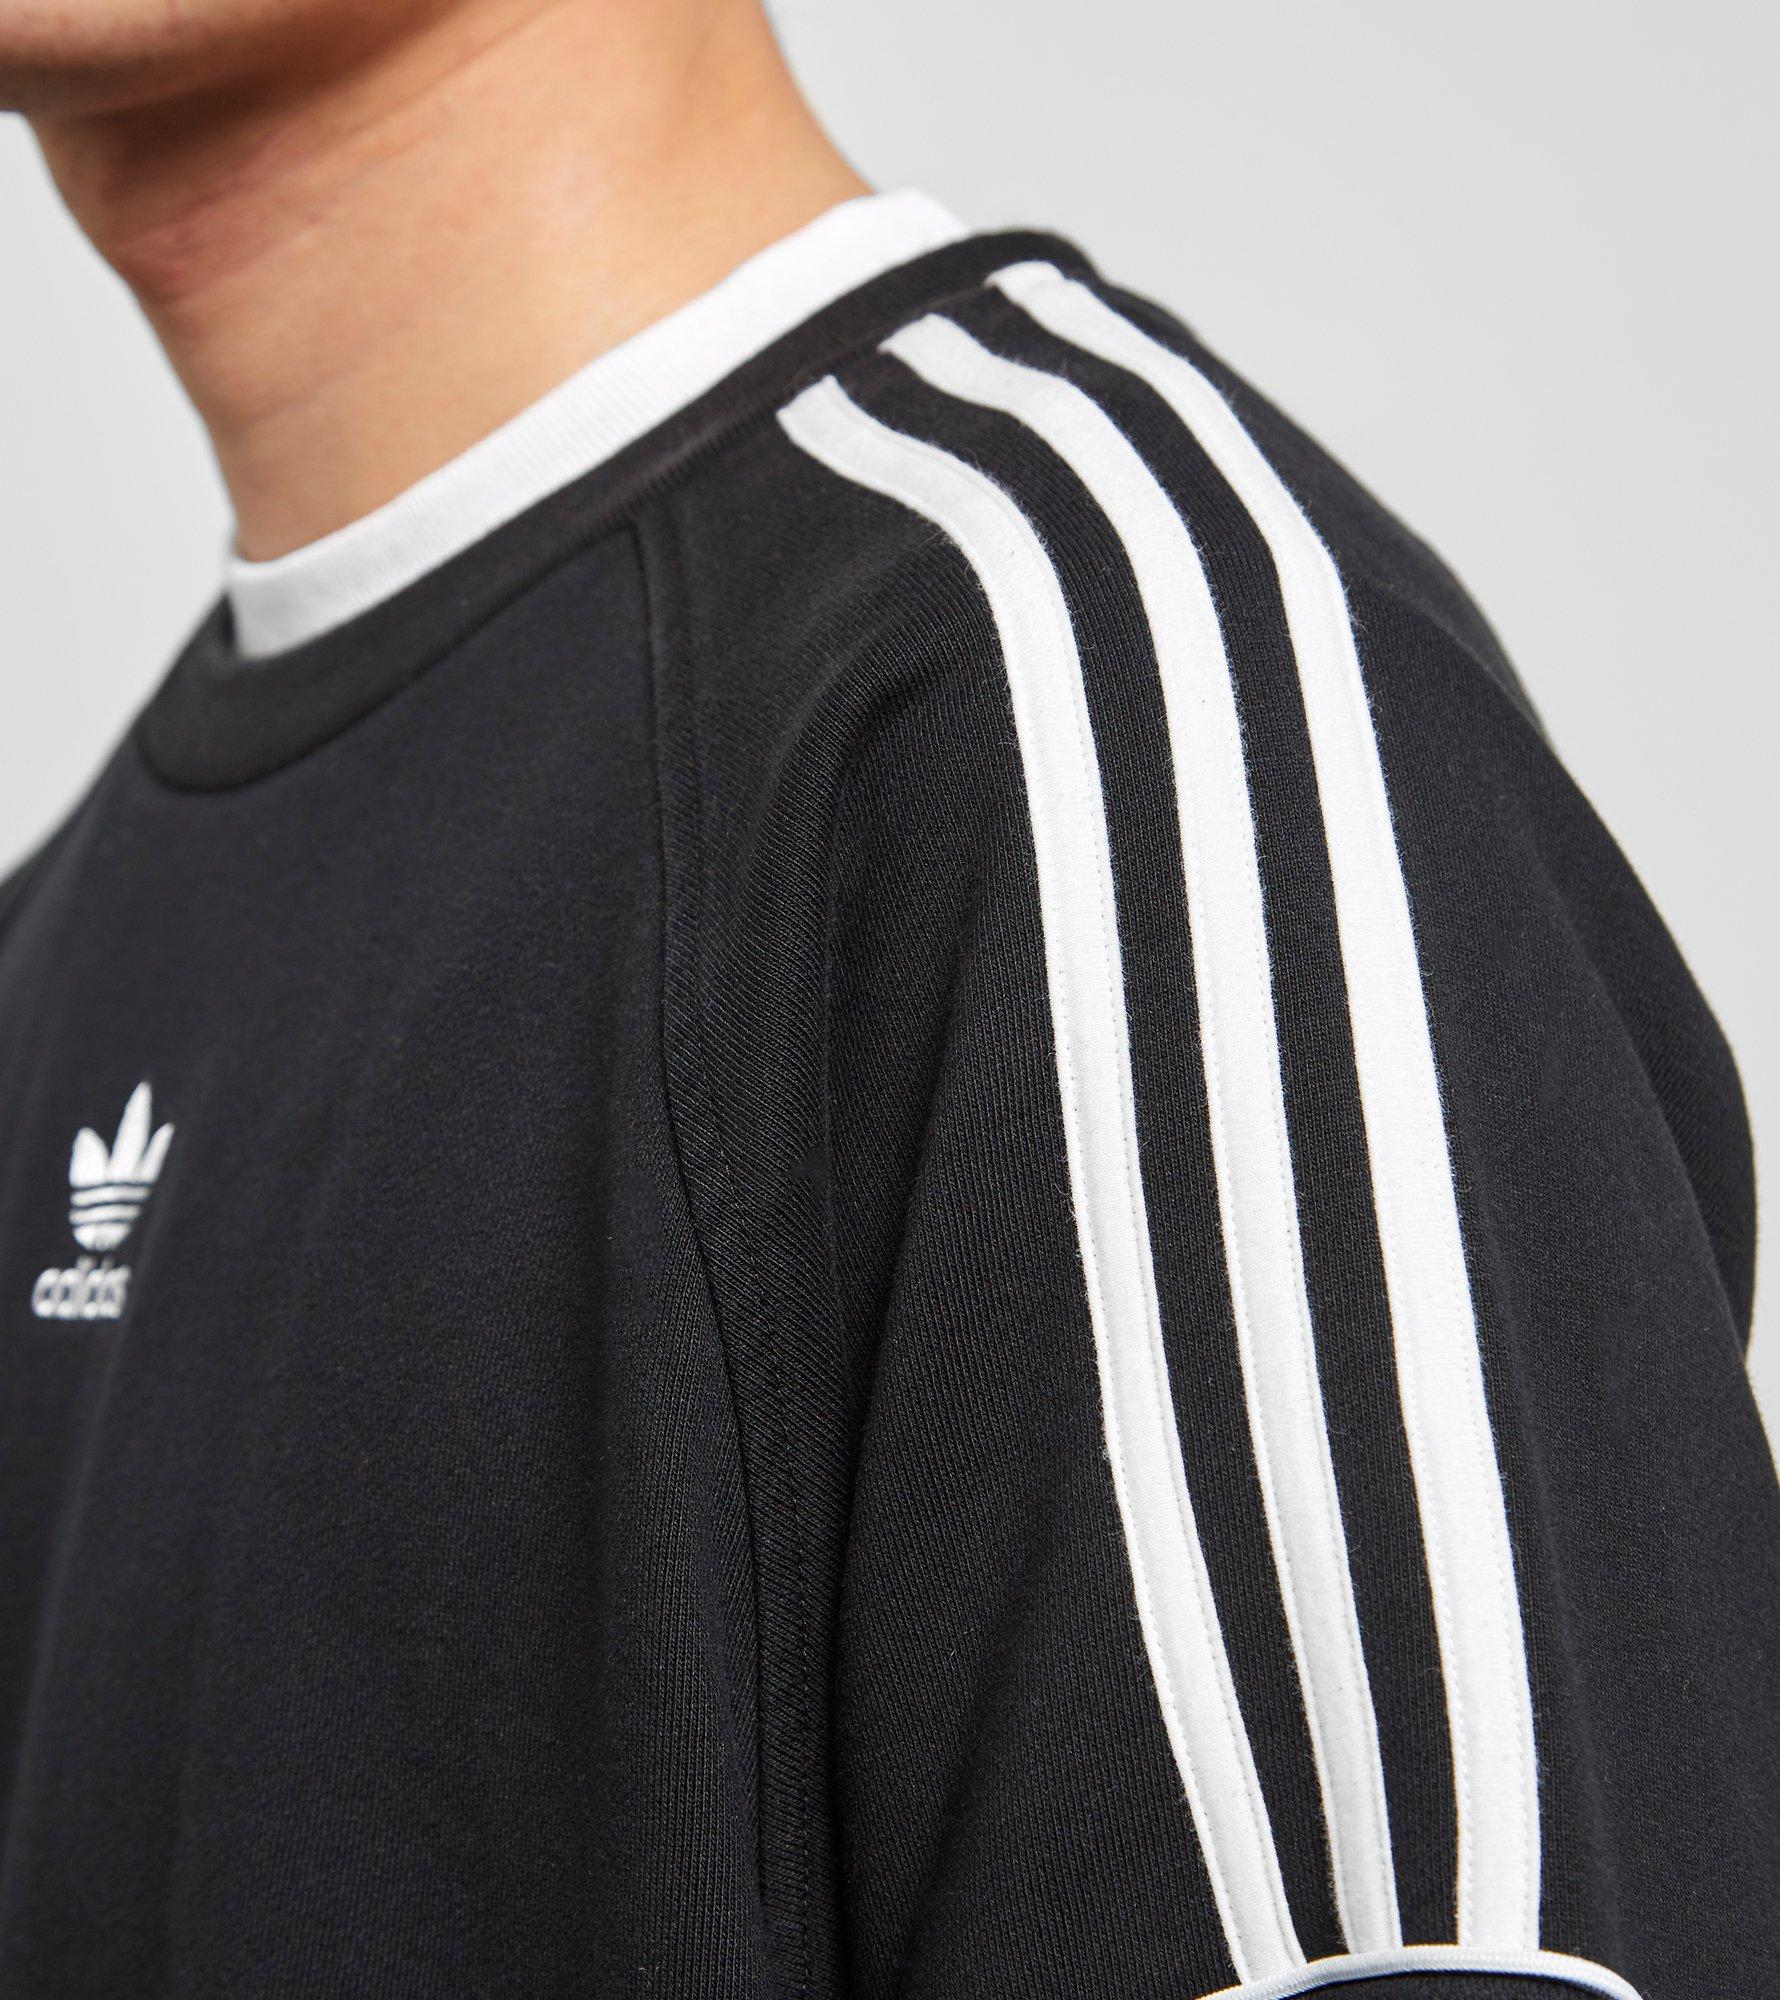 official store hot sale discount sale Pipe Crew Sweatshirt